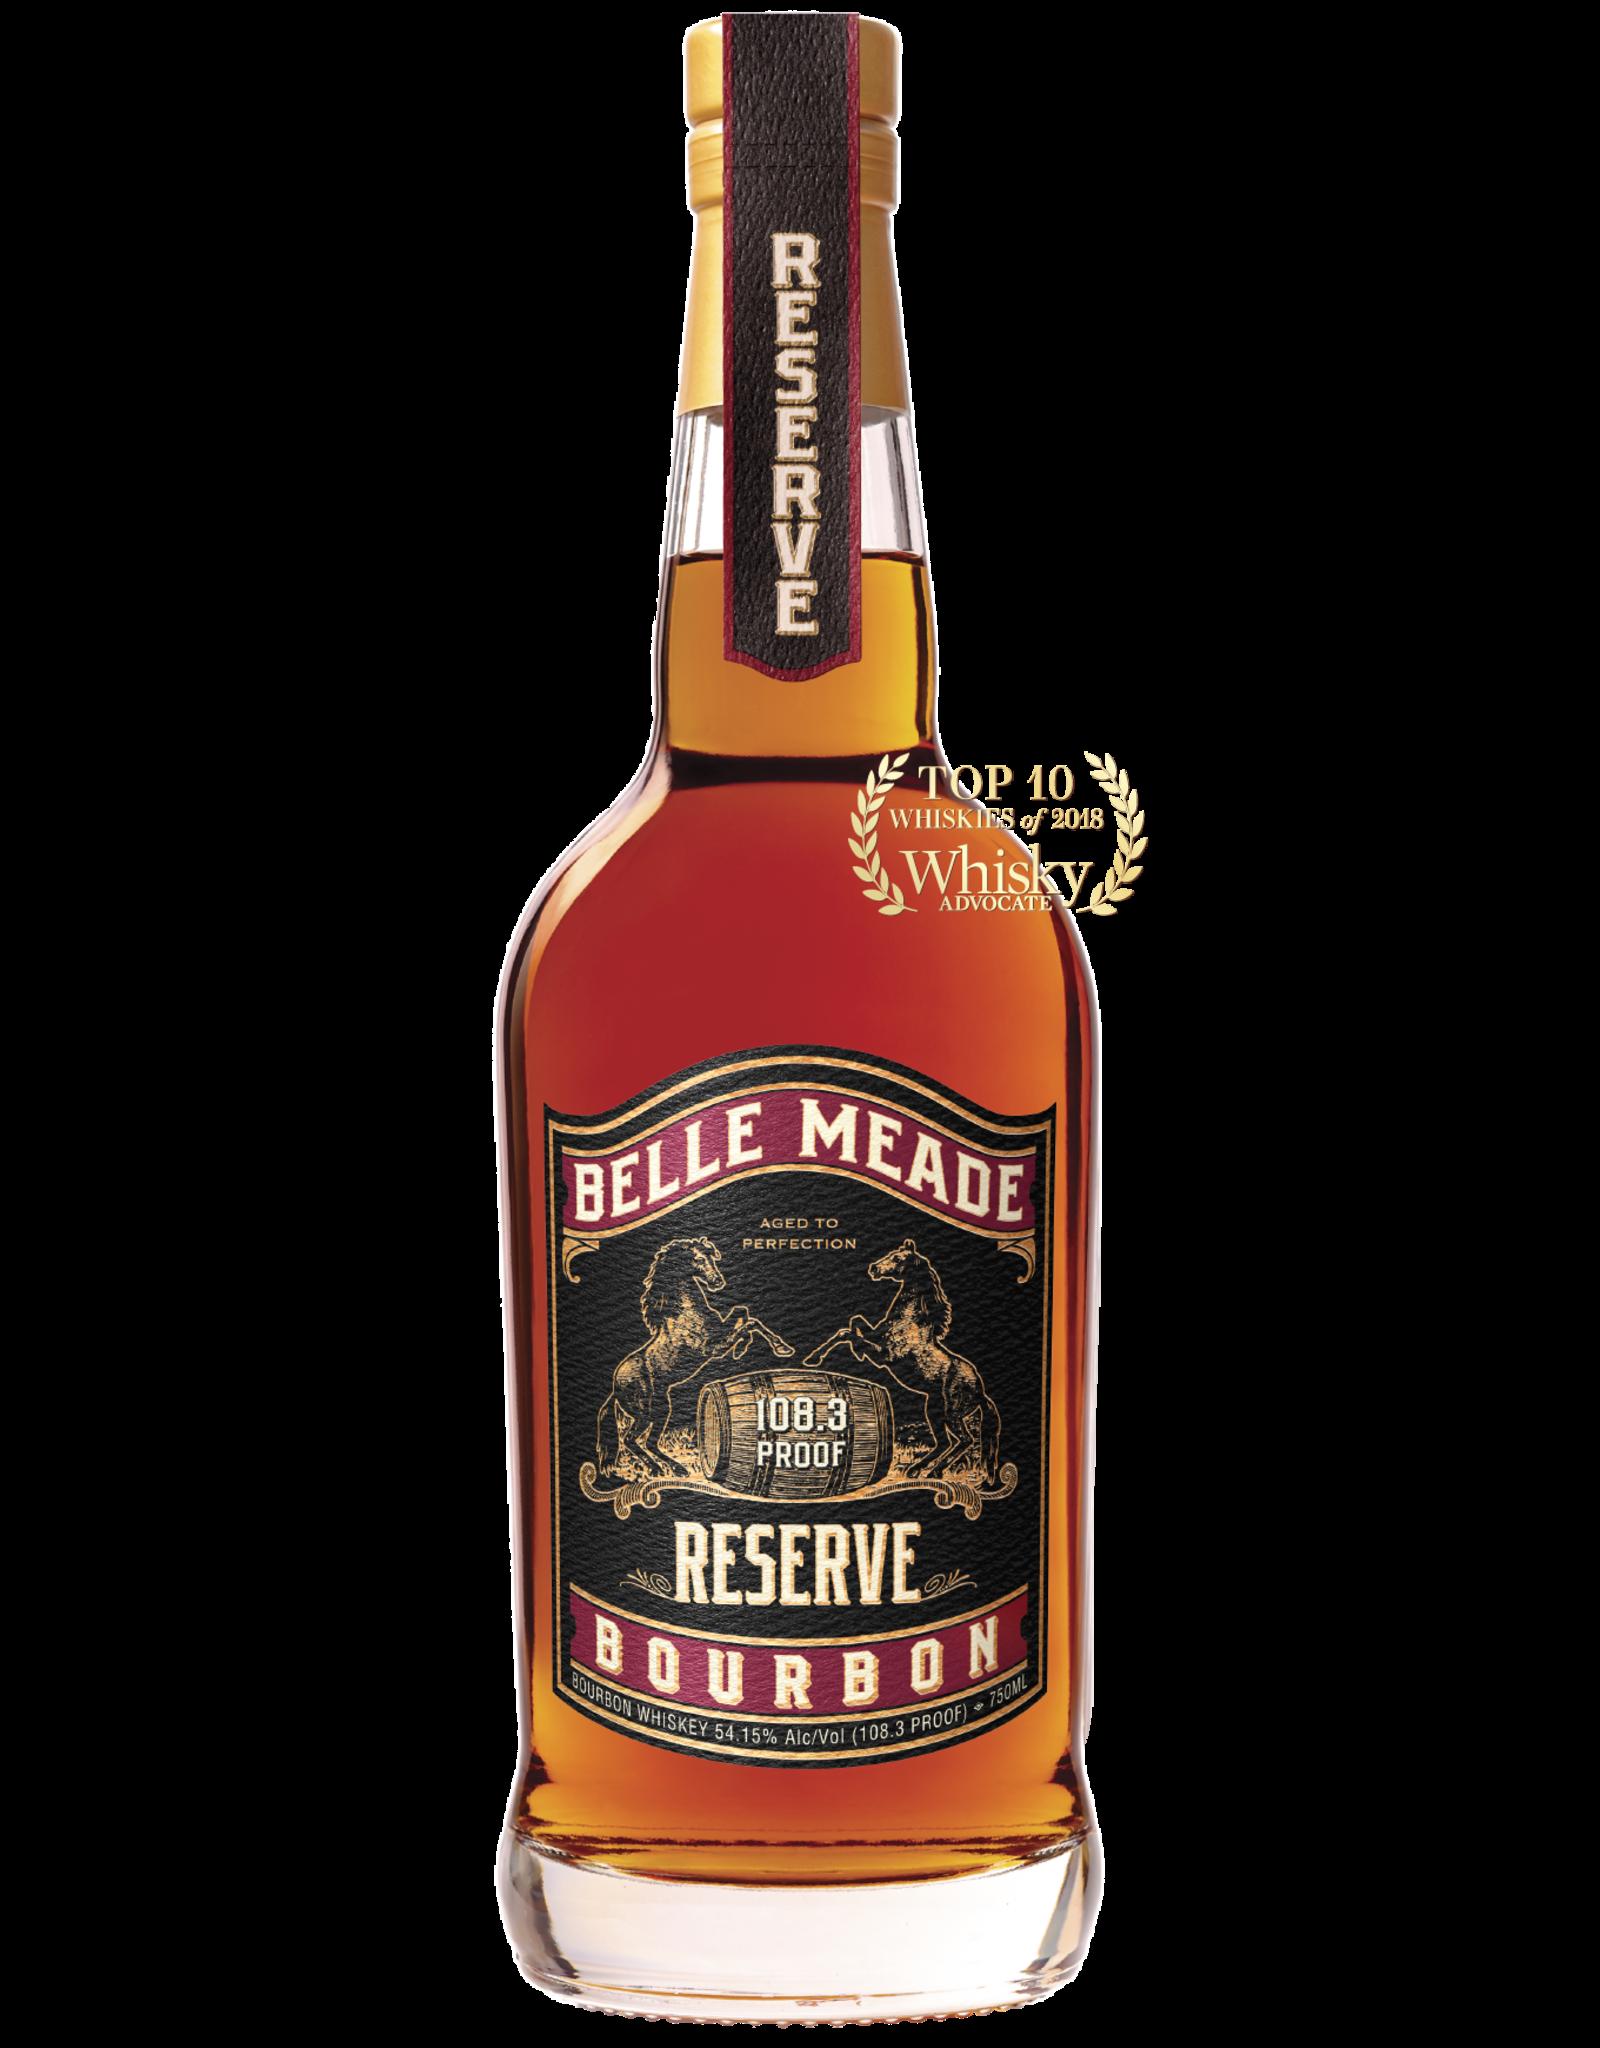 Belle Meade Reserve Bourbon 108.3